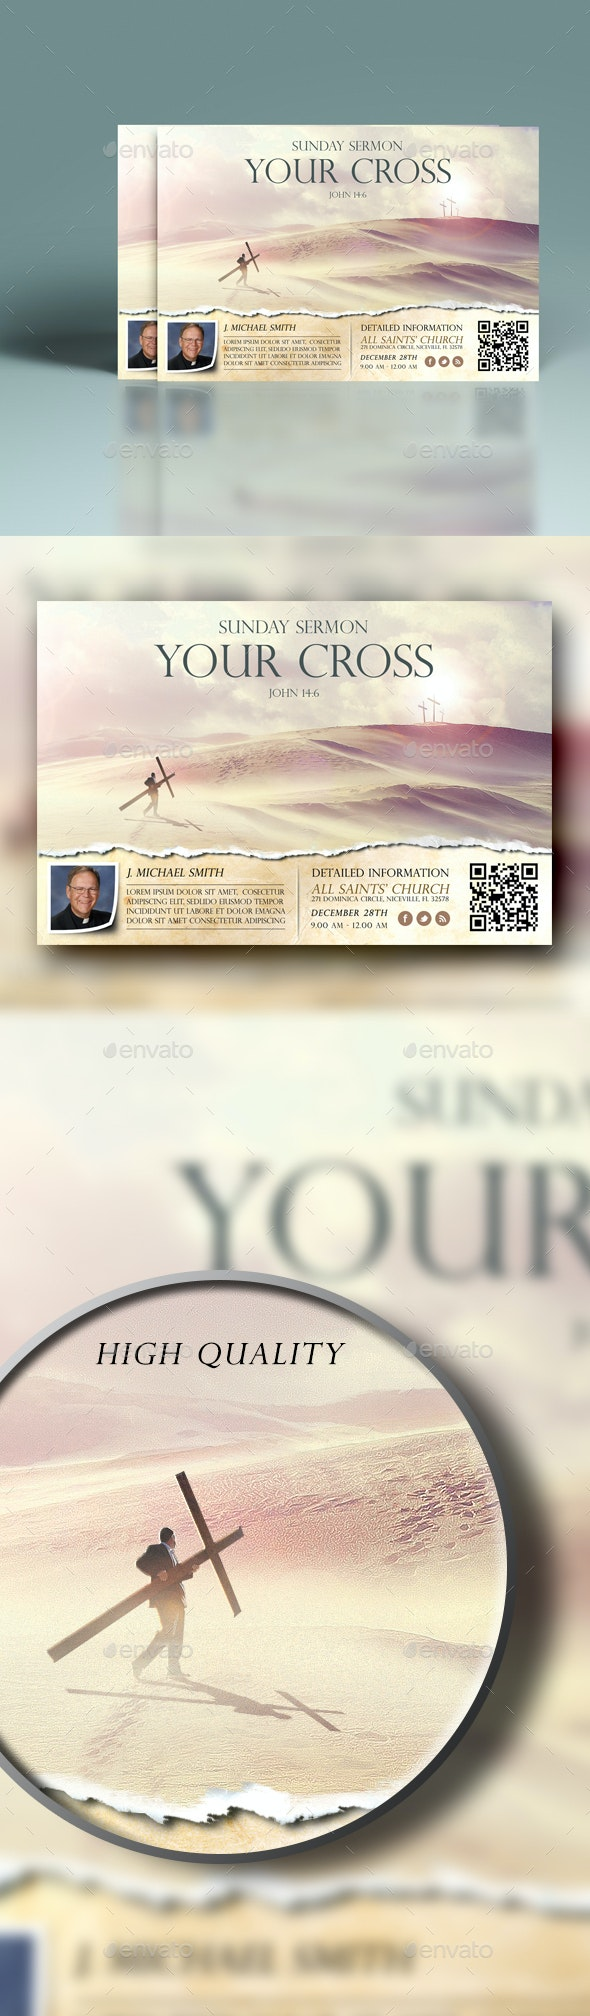 Your Cross Church Flyer - Church Flyers